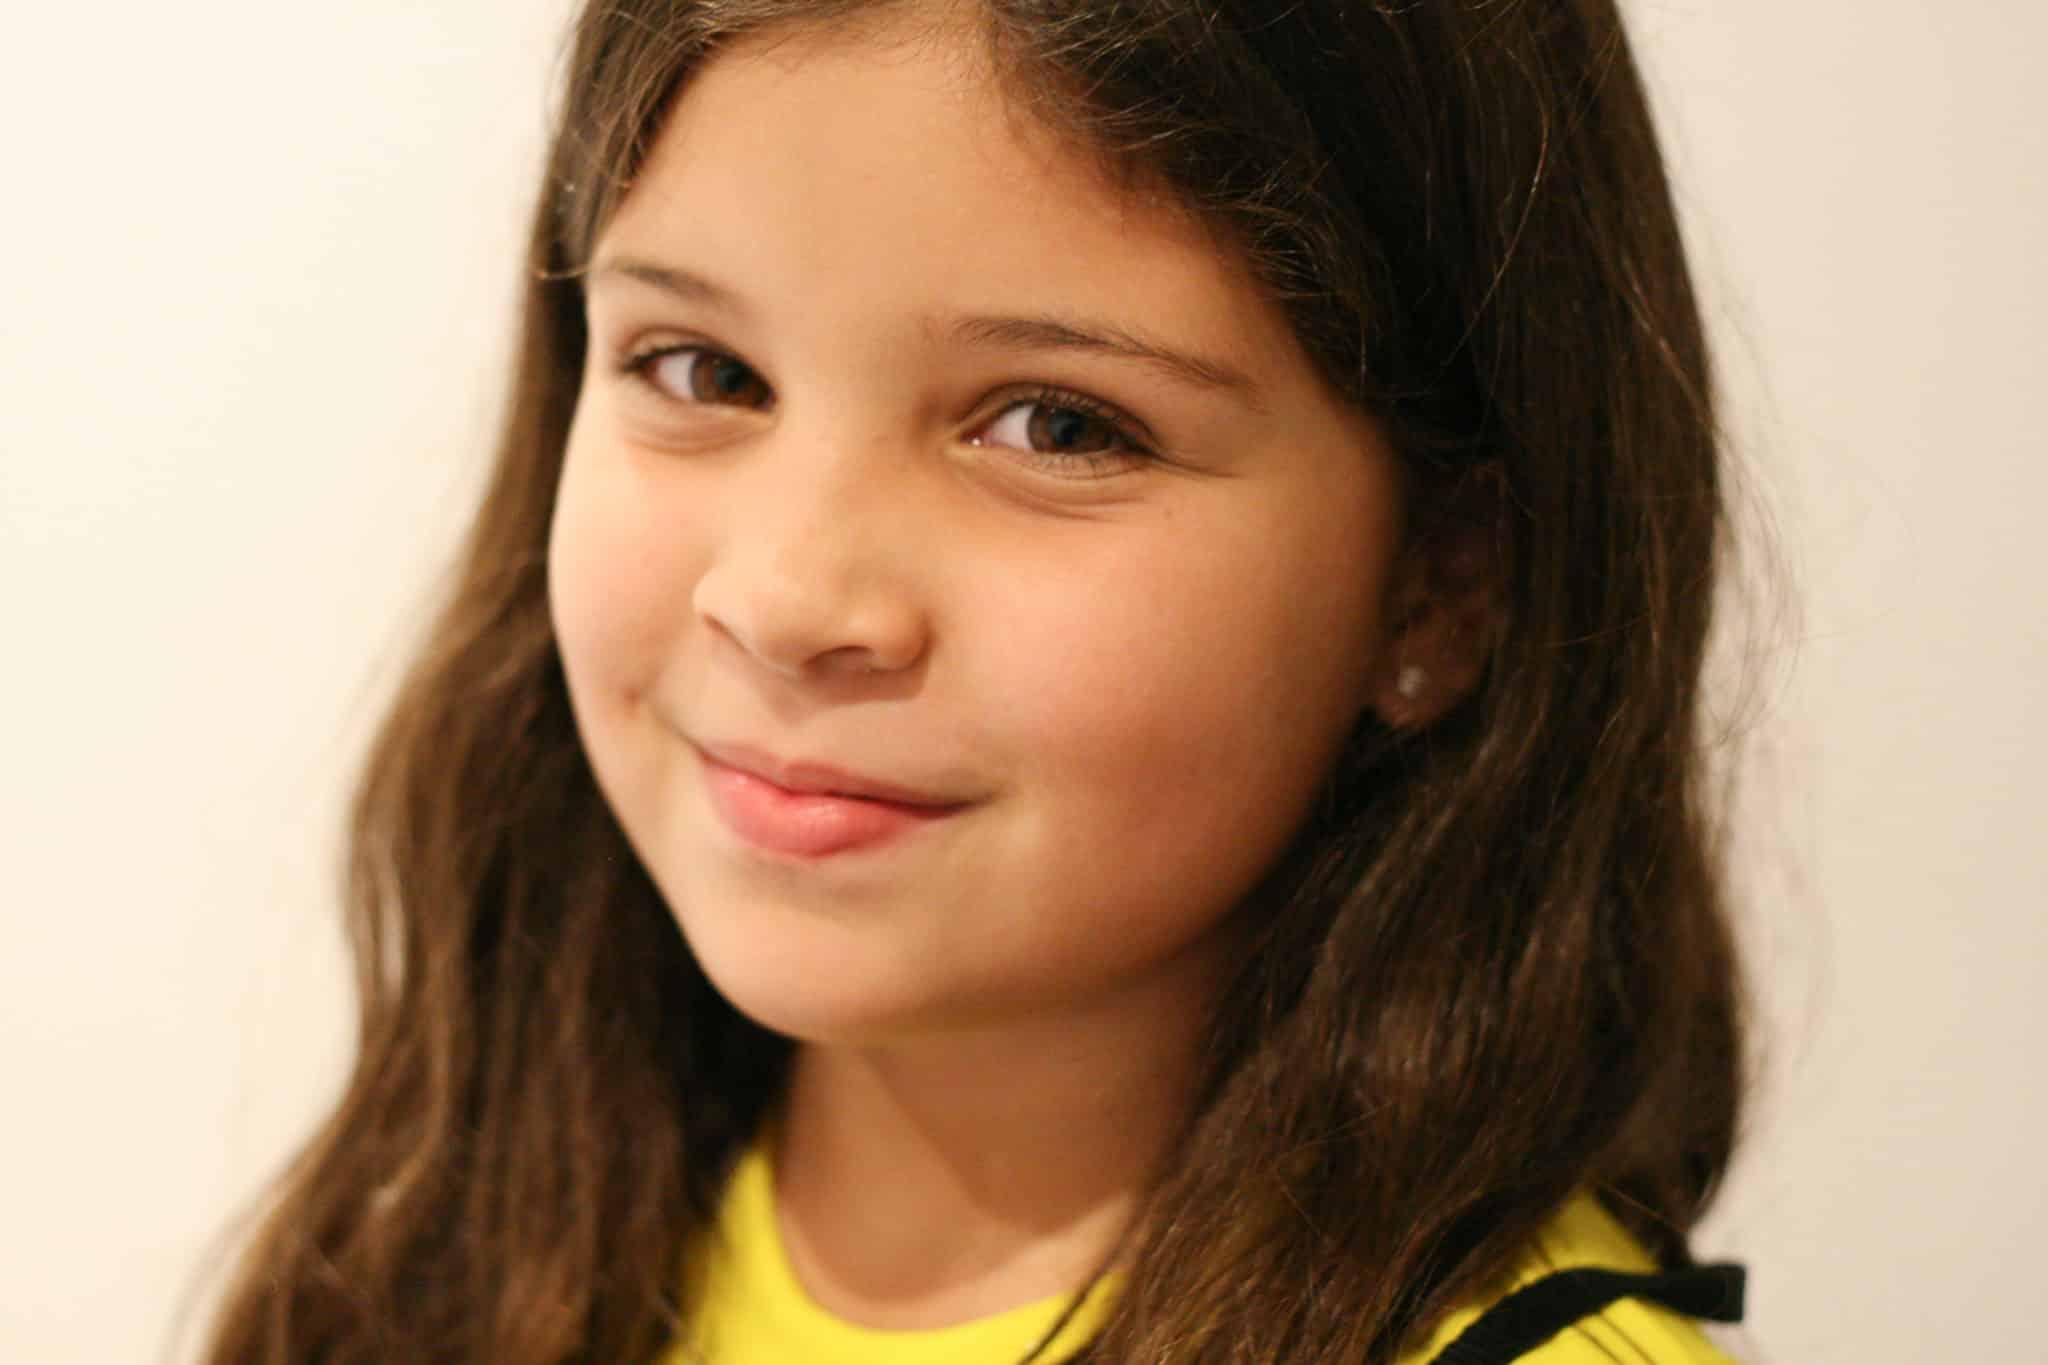 Gaby, Age 9